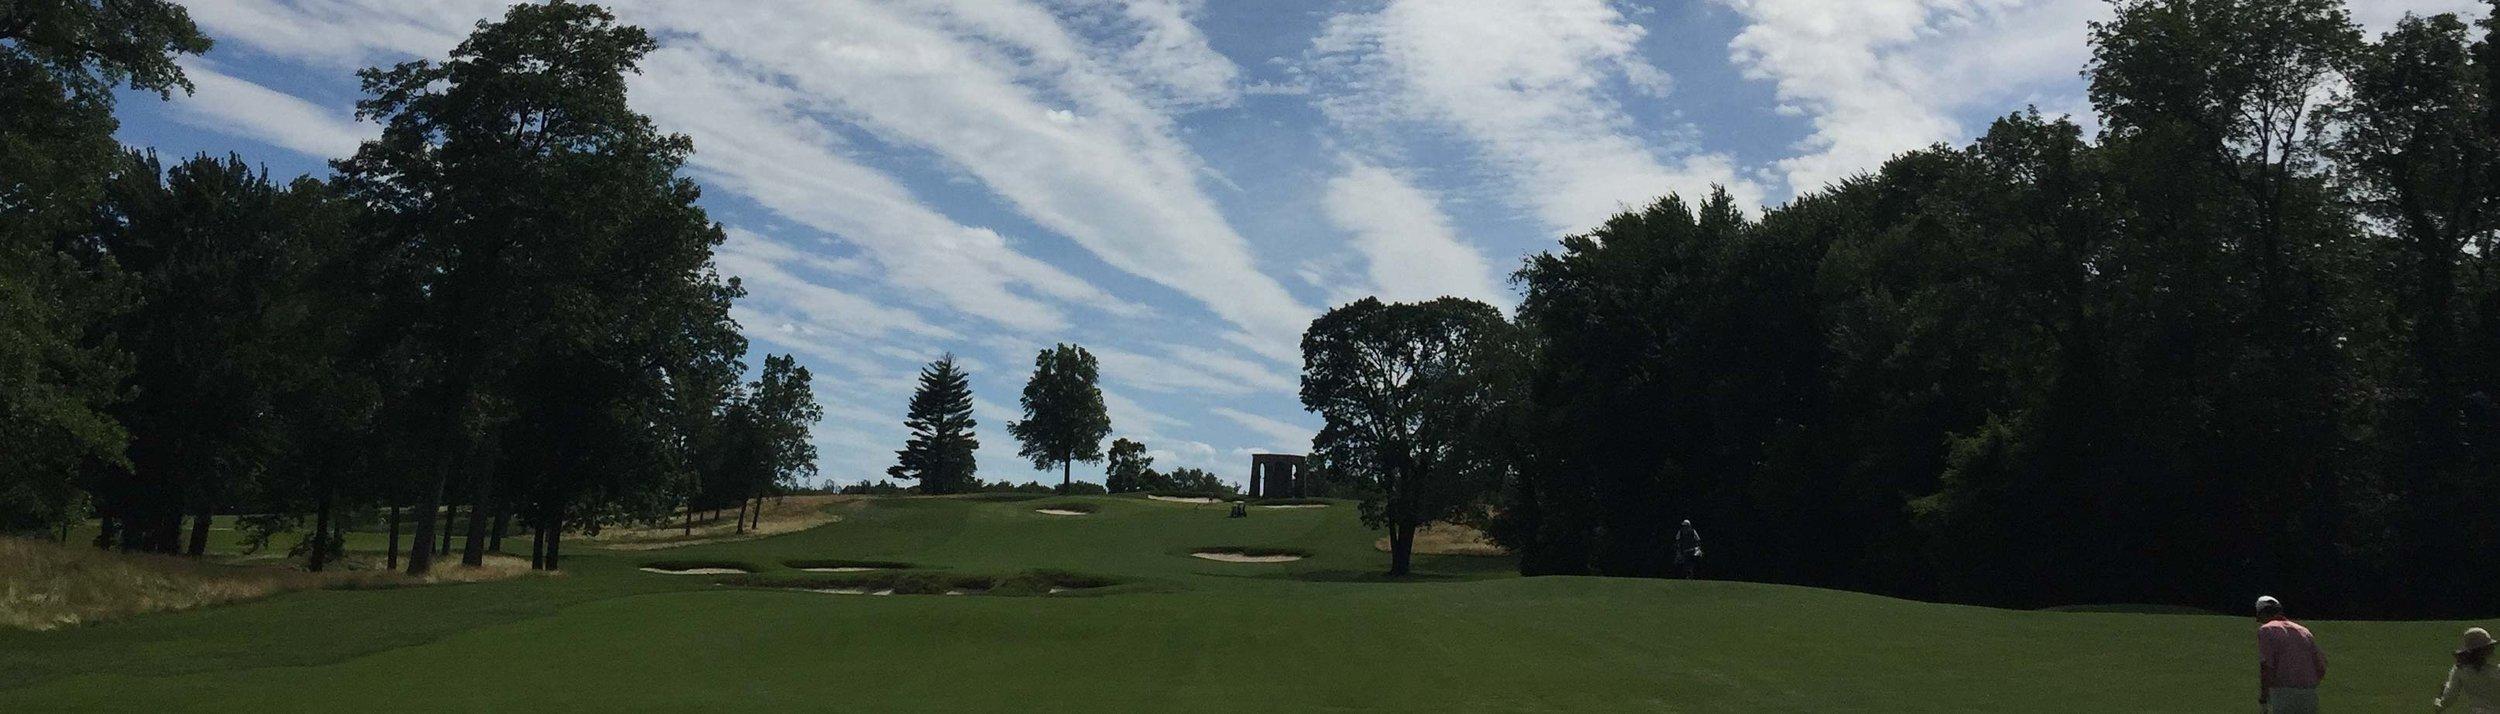 SCC 2018 Golf #7- HAP (9 of 20).jpg